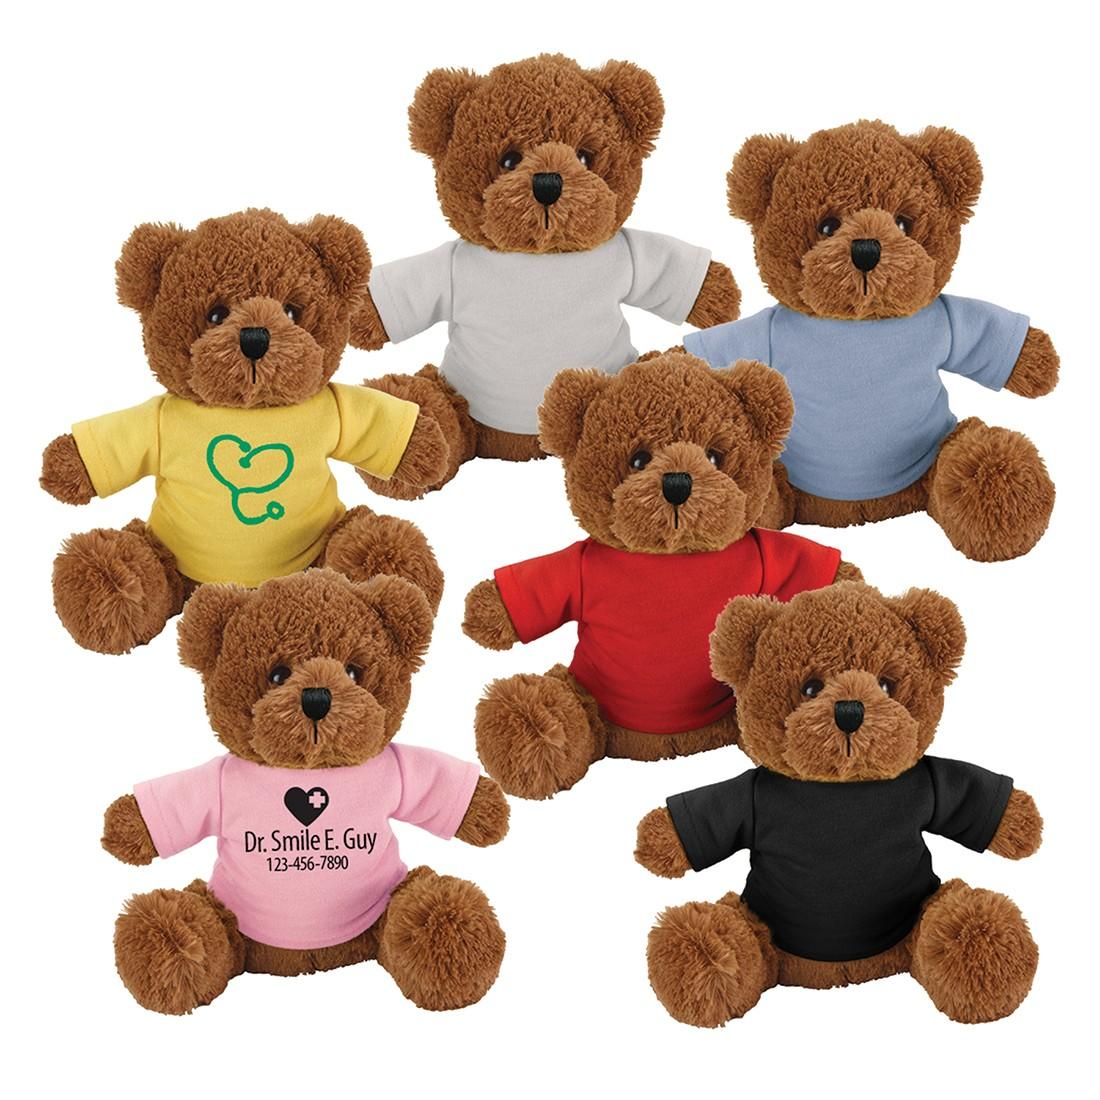 Custom Plush Fuzzy Friends Teddy Bears  [image]